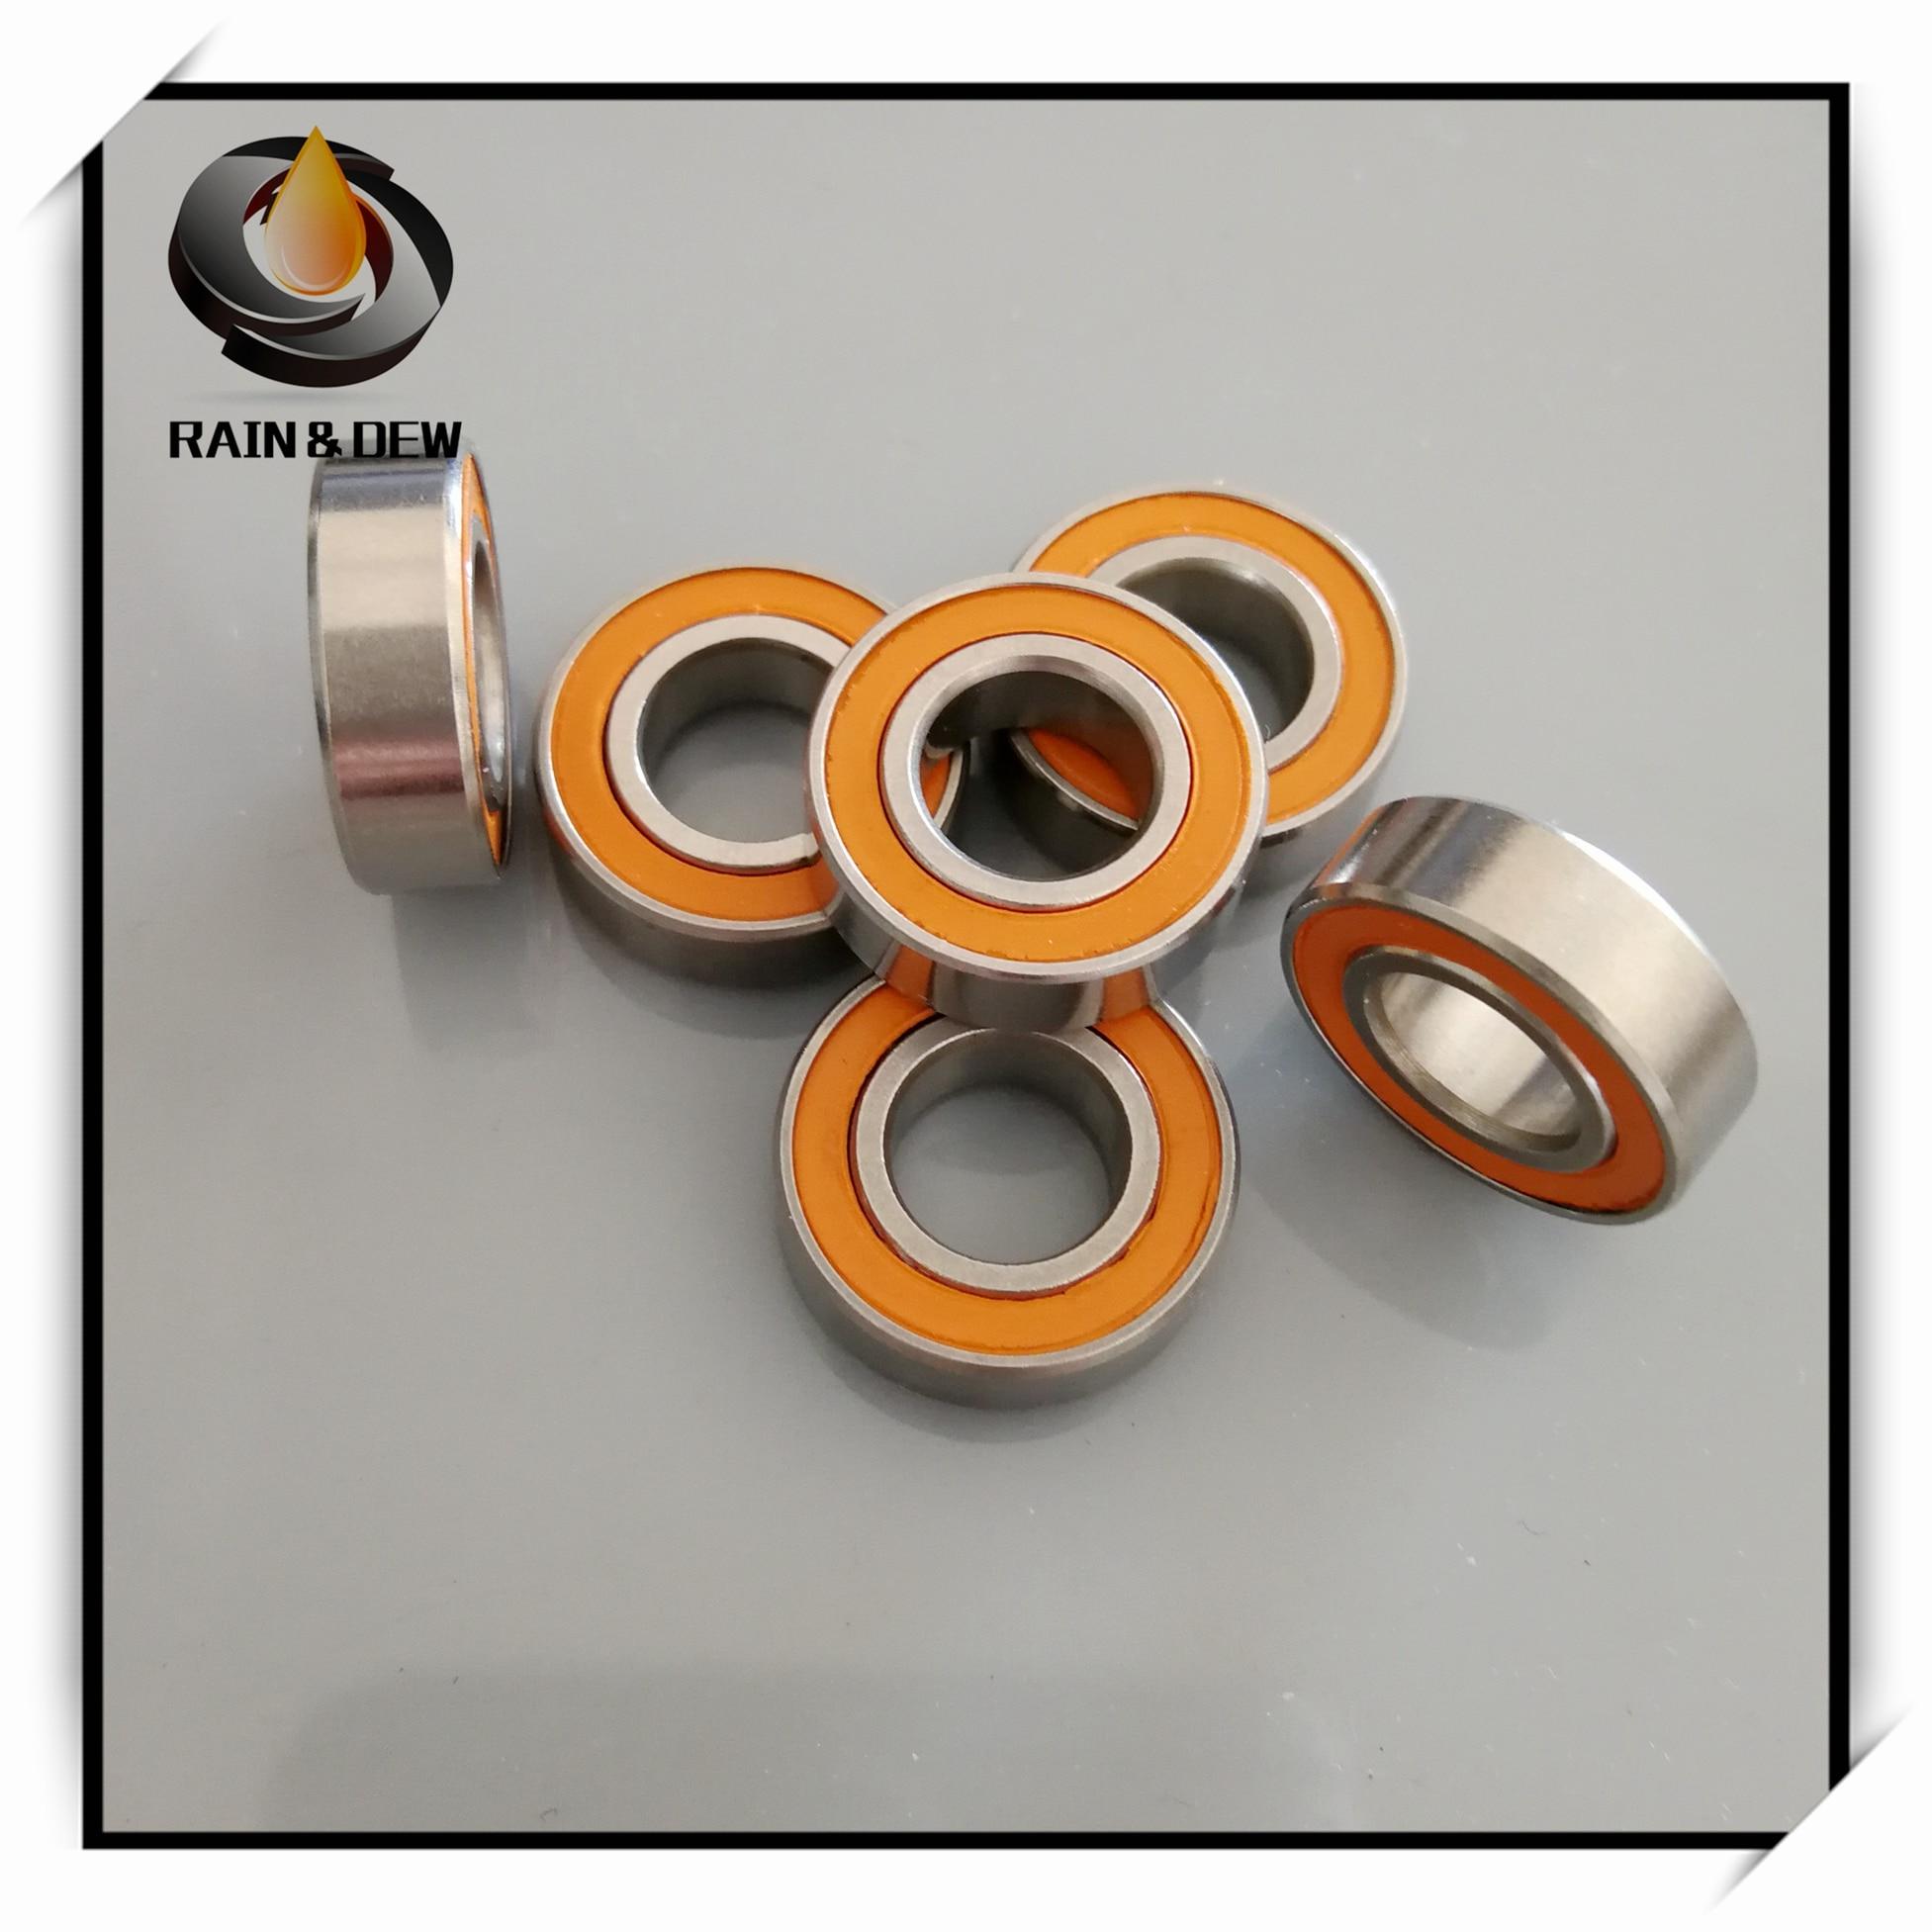 7x14x5 mm Hybrid Ceramic Ball Bearing ABEC-7 ORANGE /'/'FREE SHIPPING/'/' QTY 10